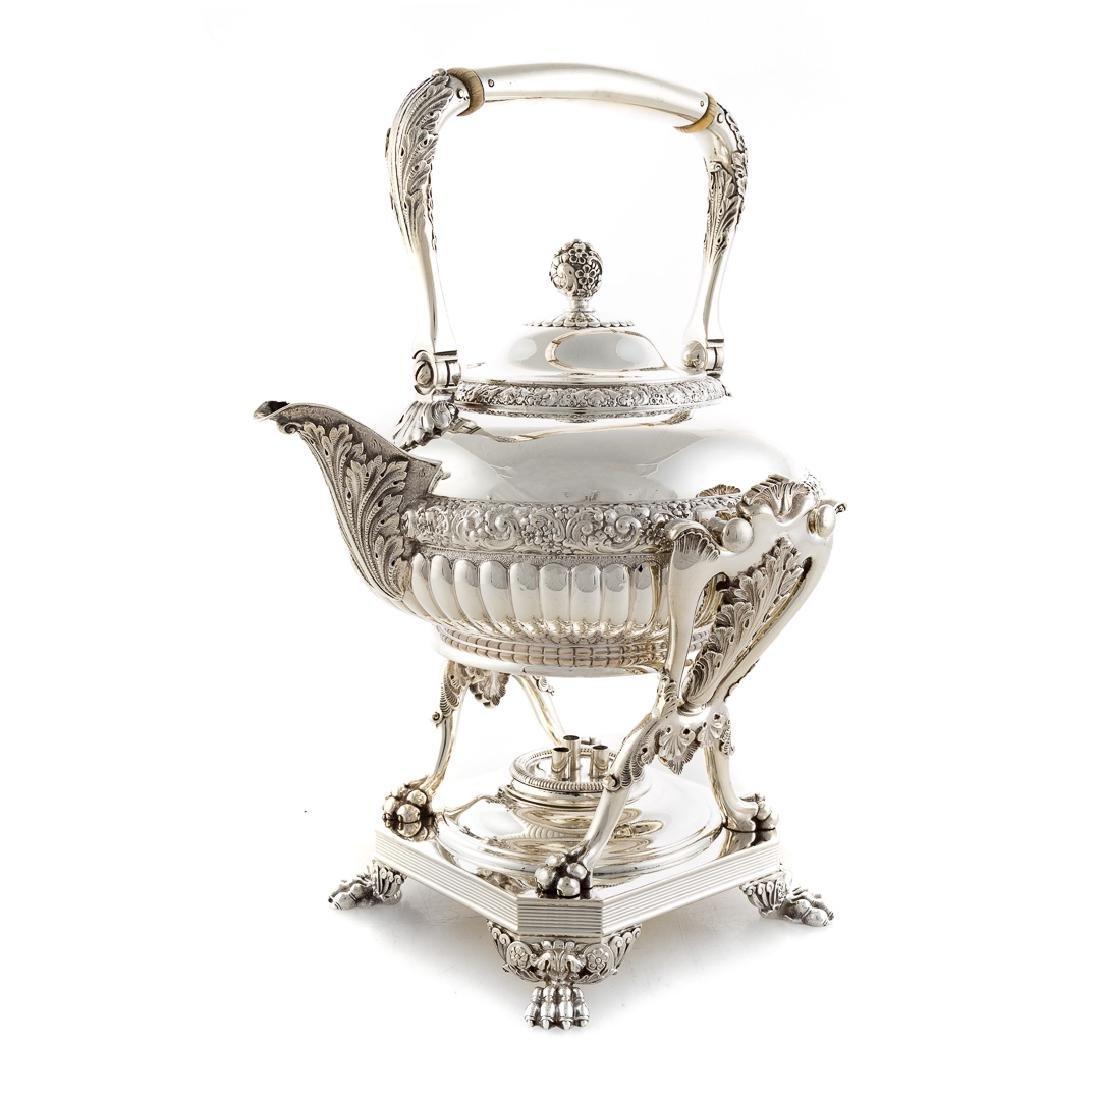 Very fine Tiffany sterling coffee & tea service - 4